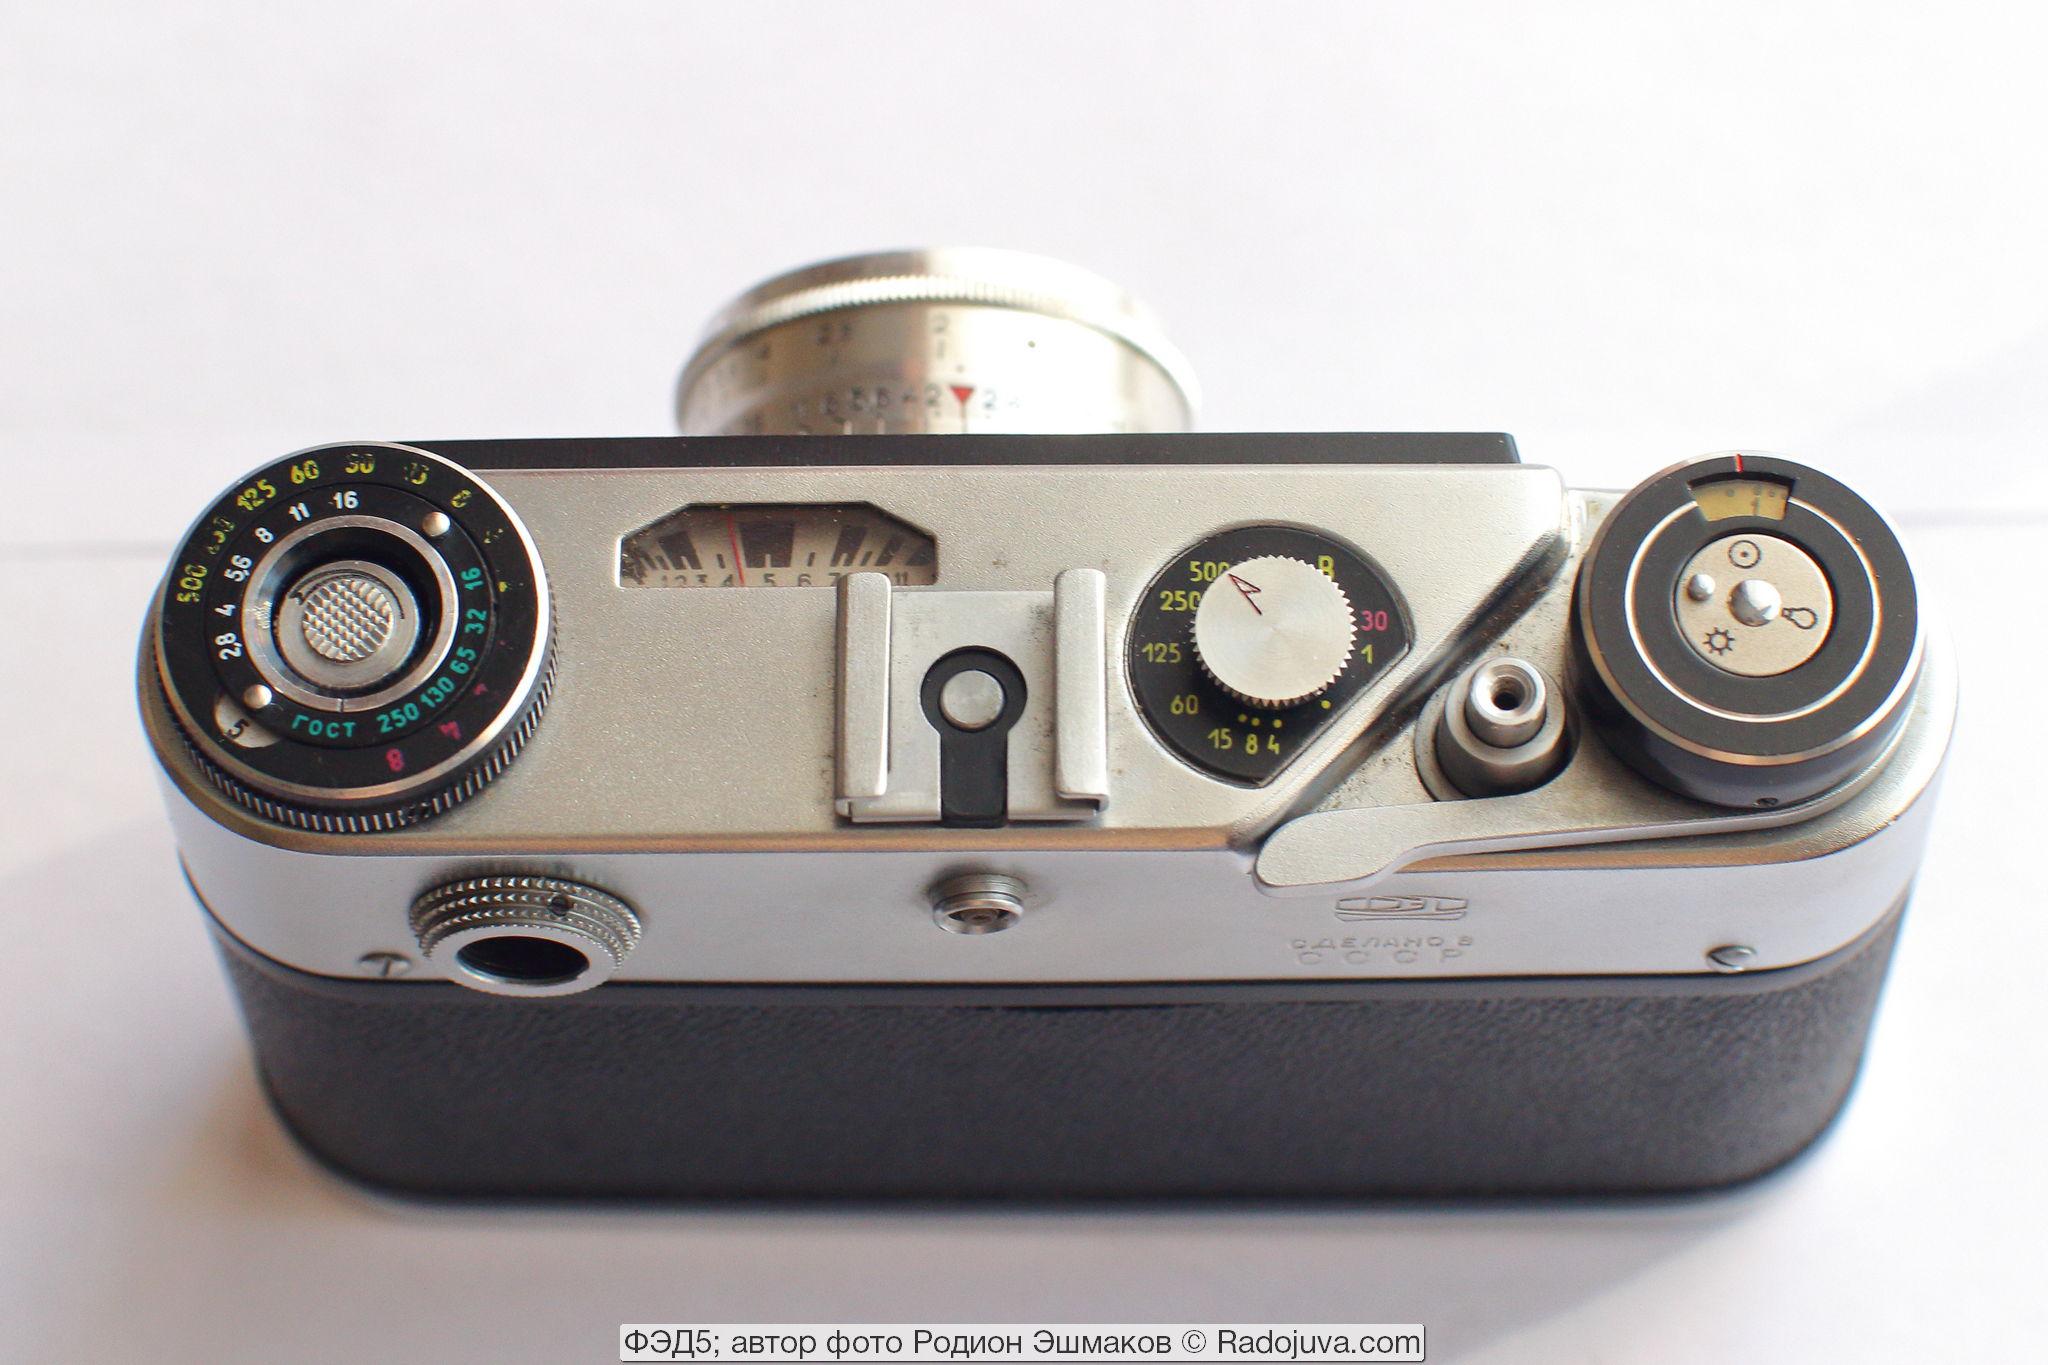 Top panel FED-5 camera